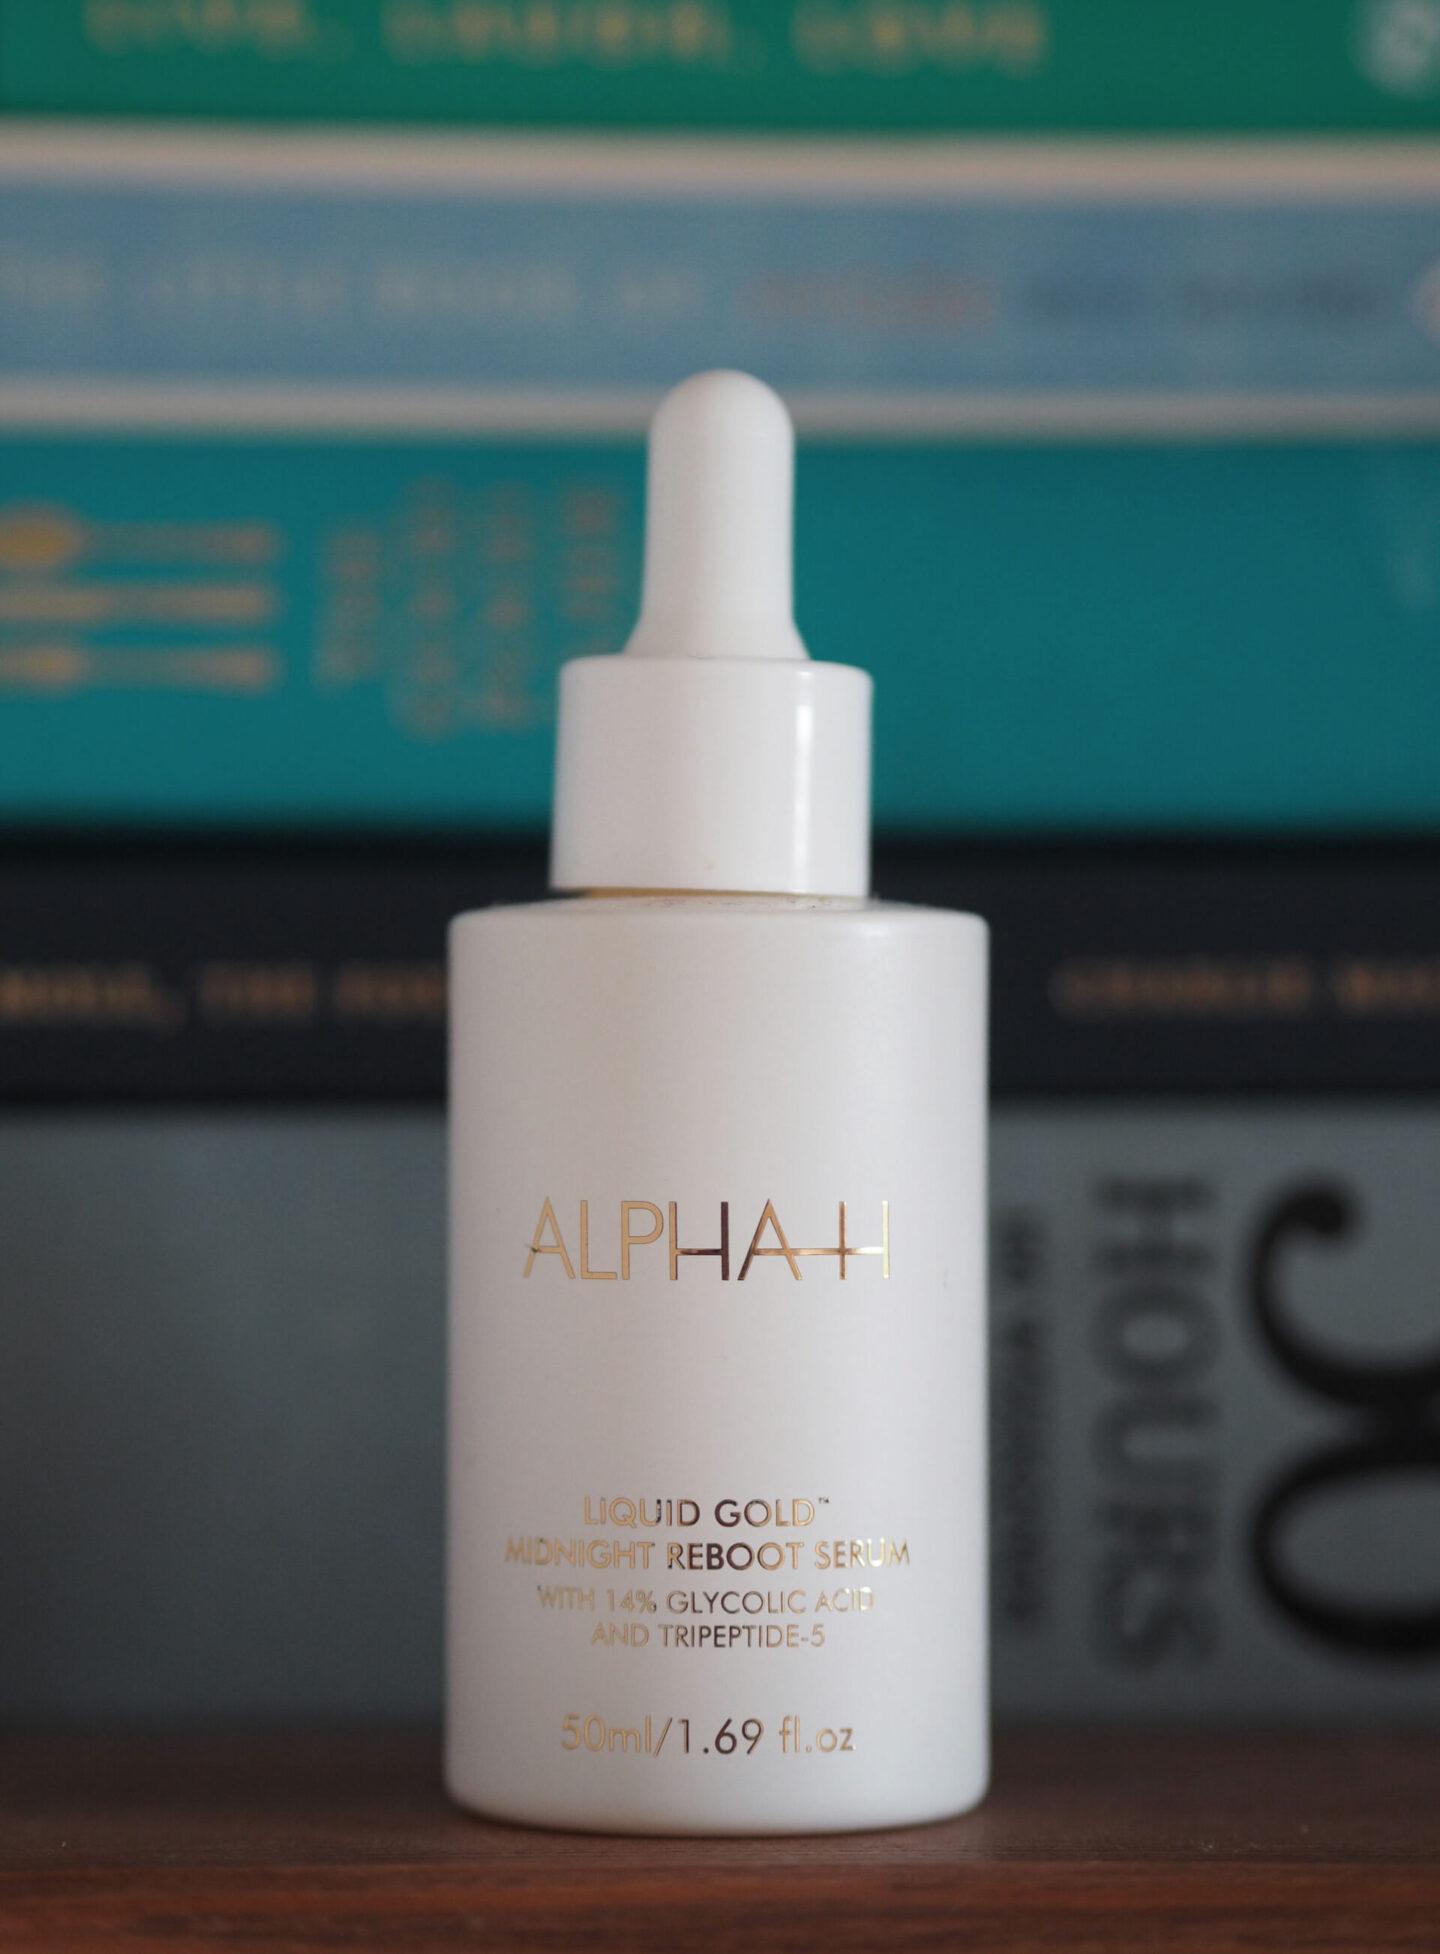 Alpha H liquid gold midnight reboot serum review